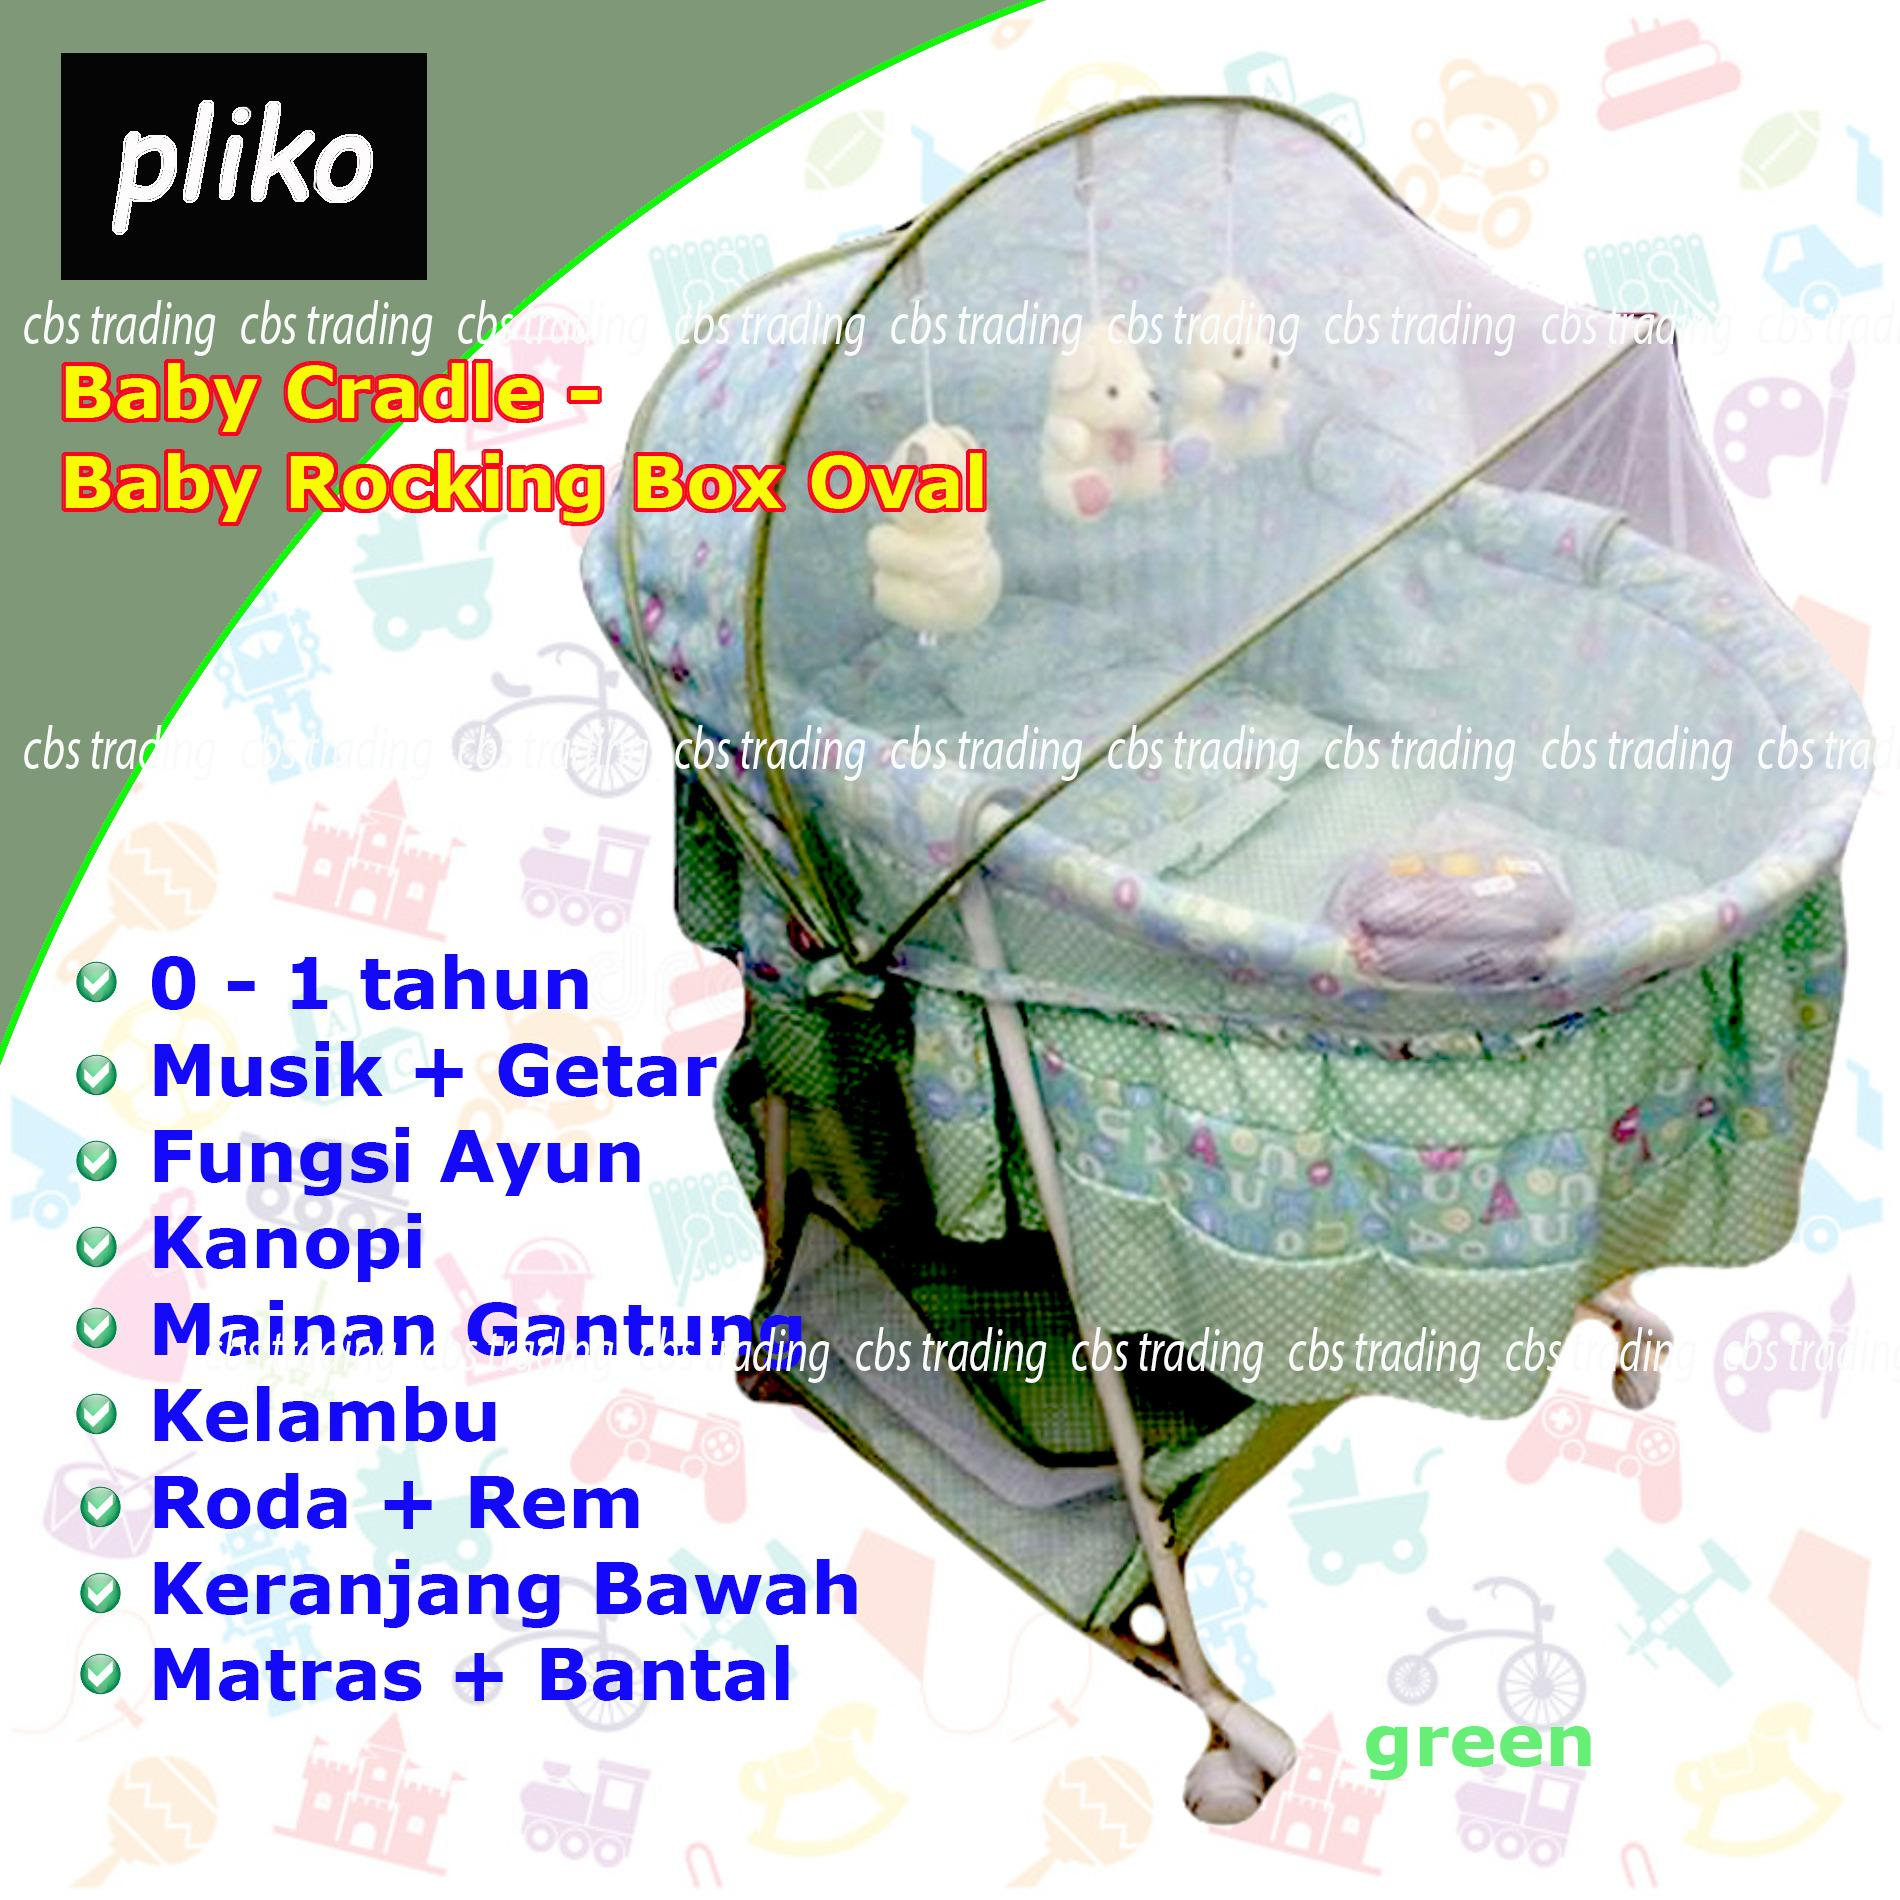 Harga Hemat Pliko Cradle Swing B608An Box Oval Ranjang Bayi Ayun Kelambu Hijau